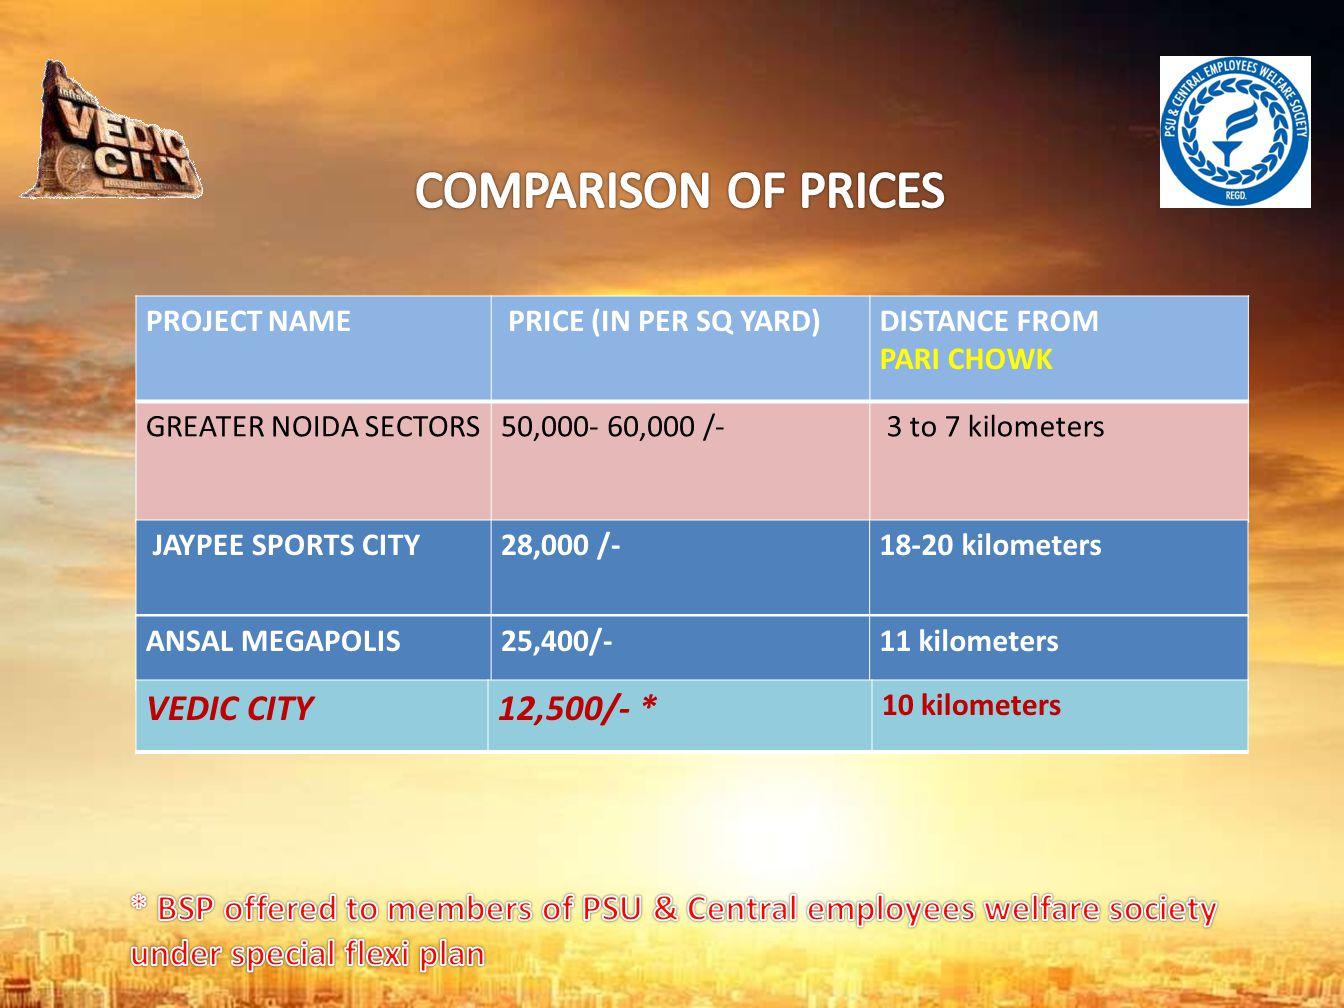 COMPARISON OF PRICES VEDIC CITY 12,500/- *